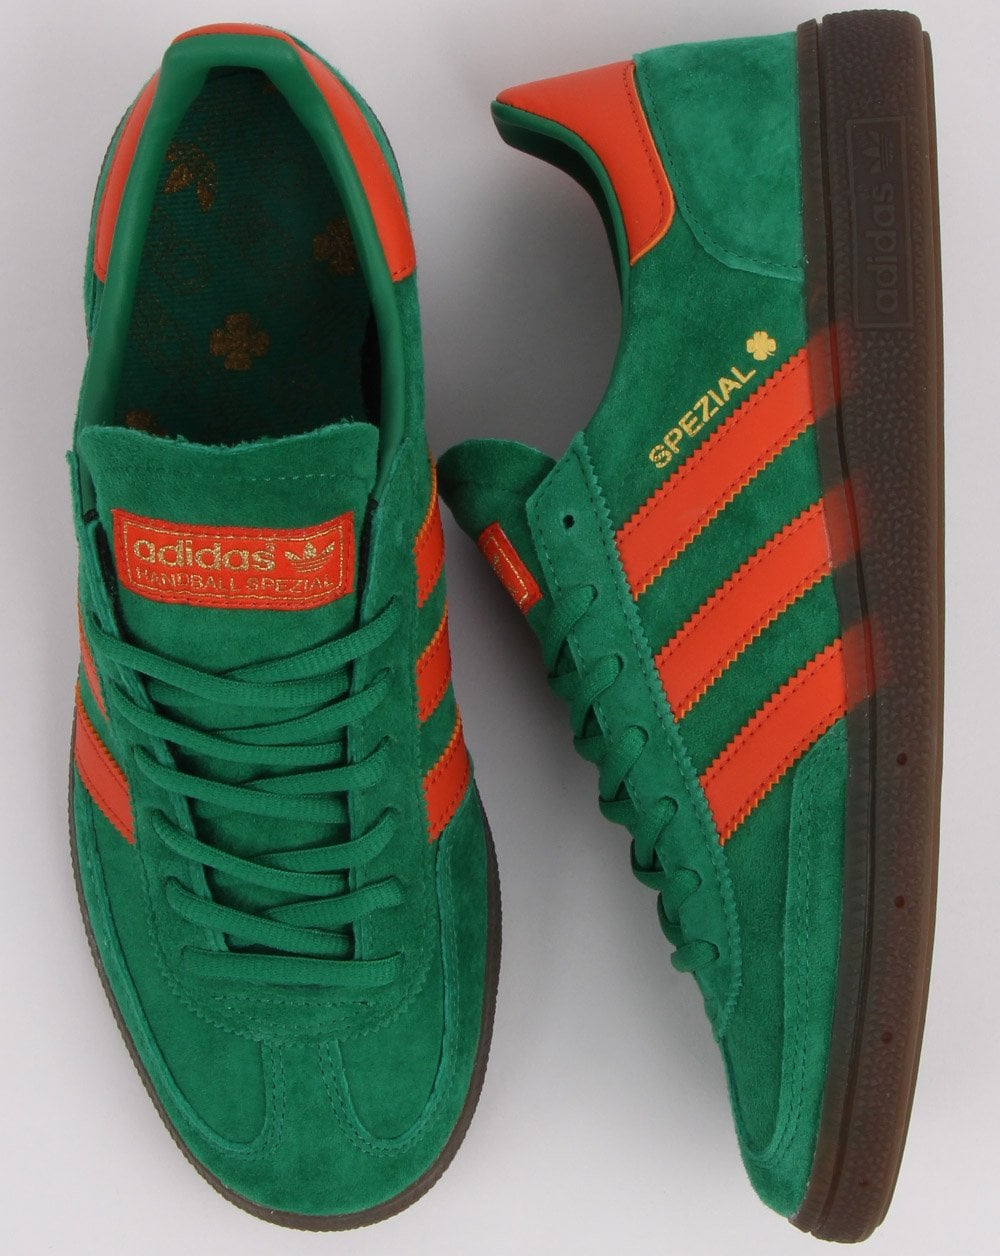 45749b4c2 Adidas Handball Spezial Trainers Green, Orange | 80s casual classics